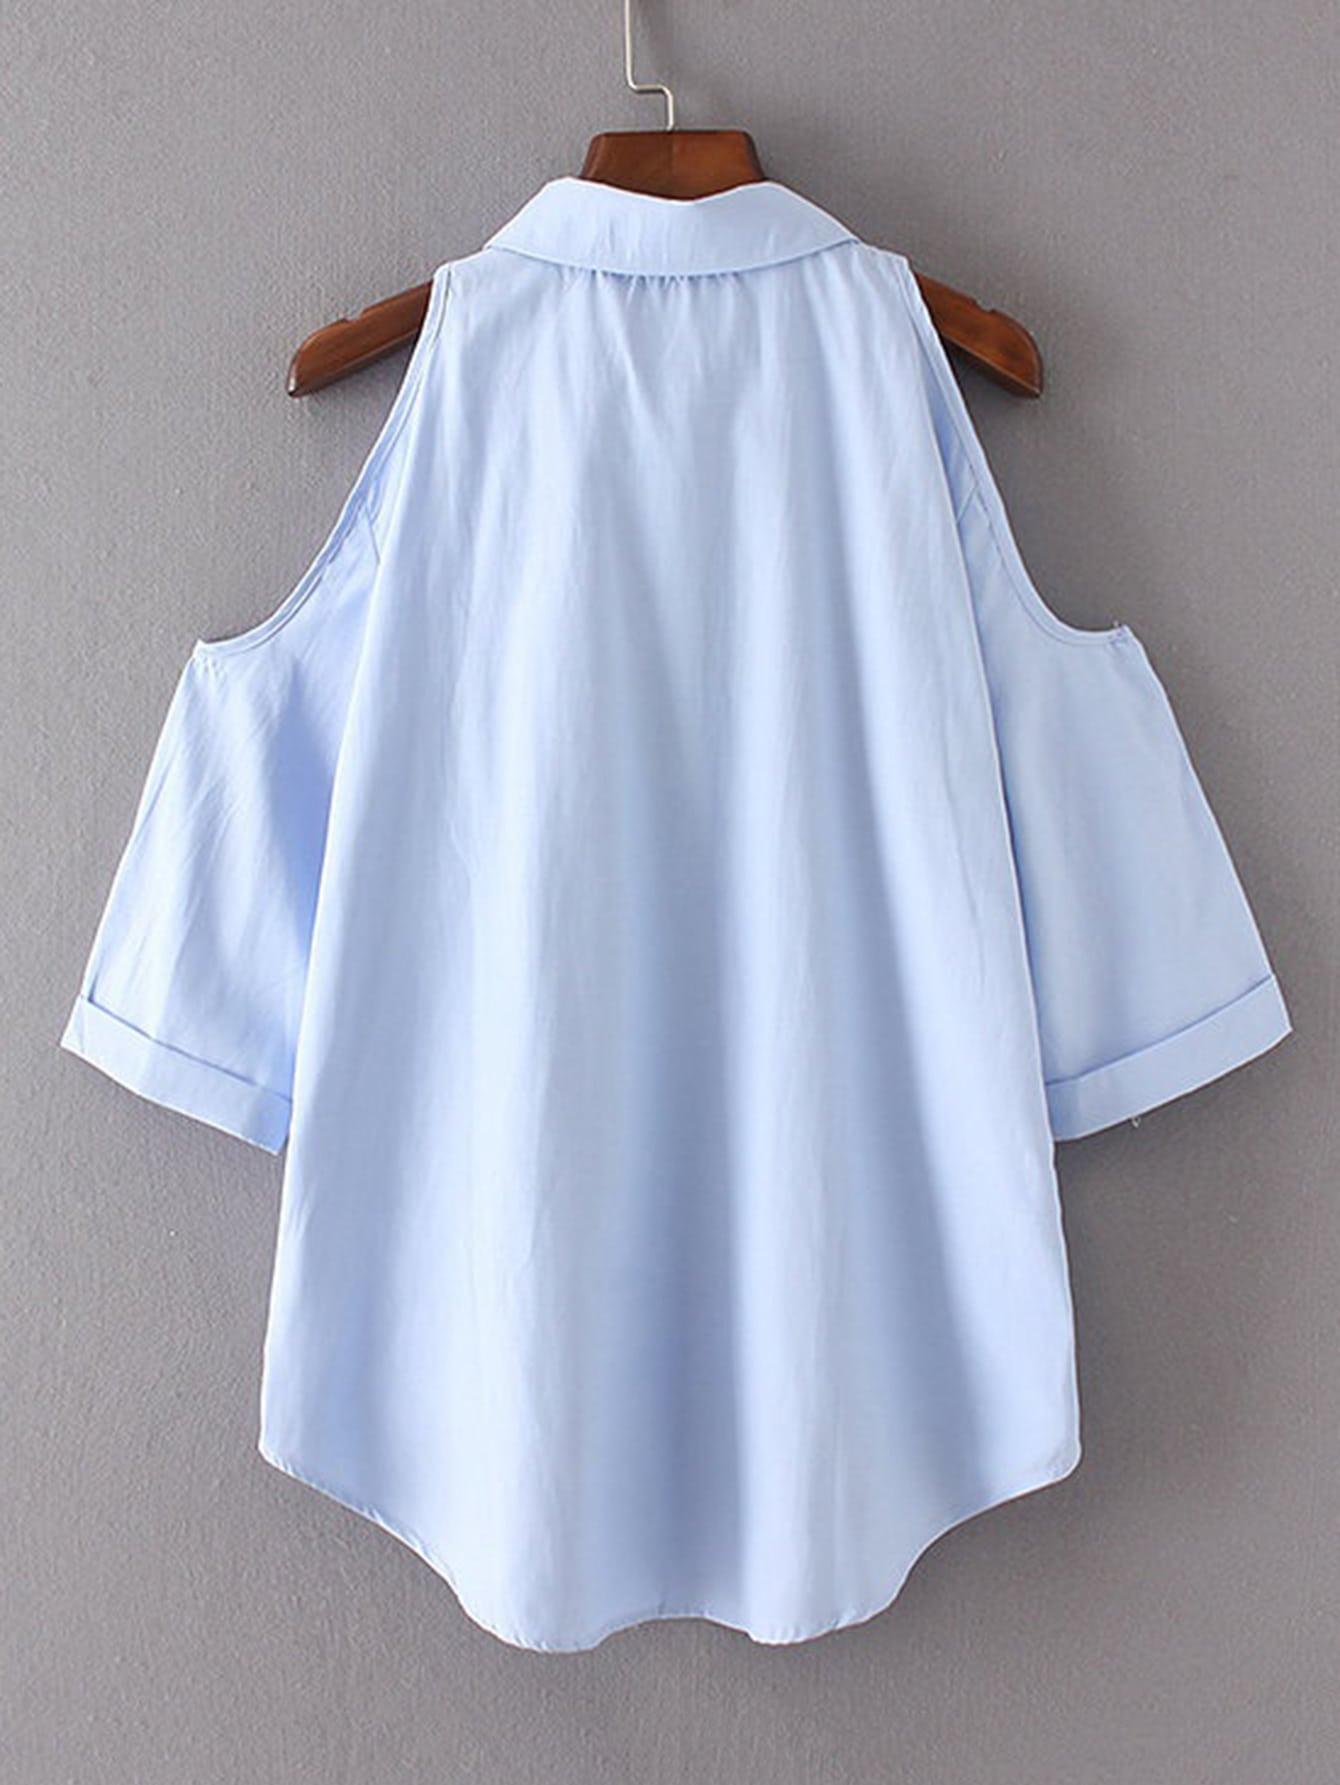 blouse170412204_2